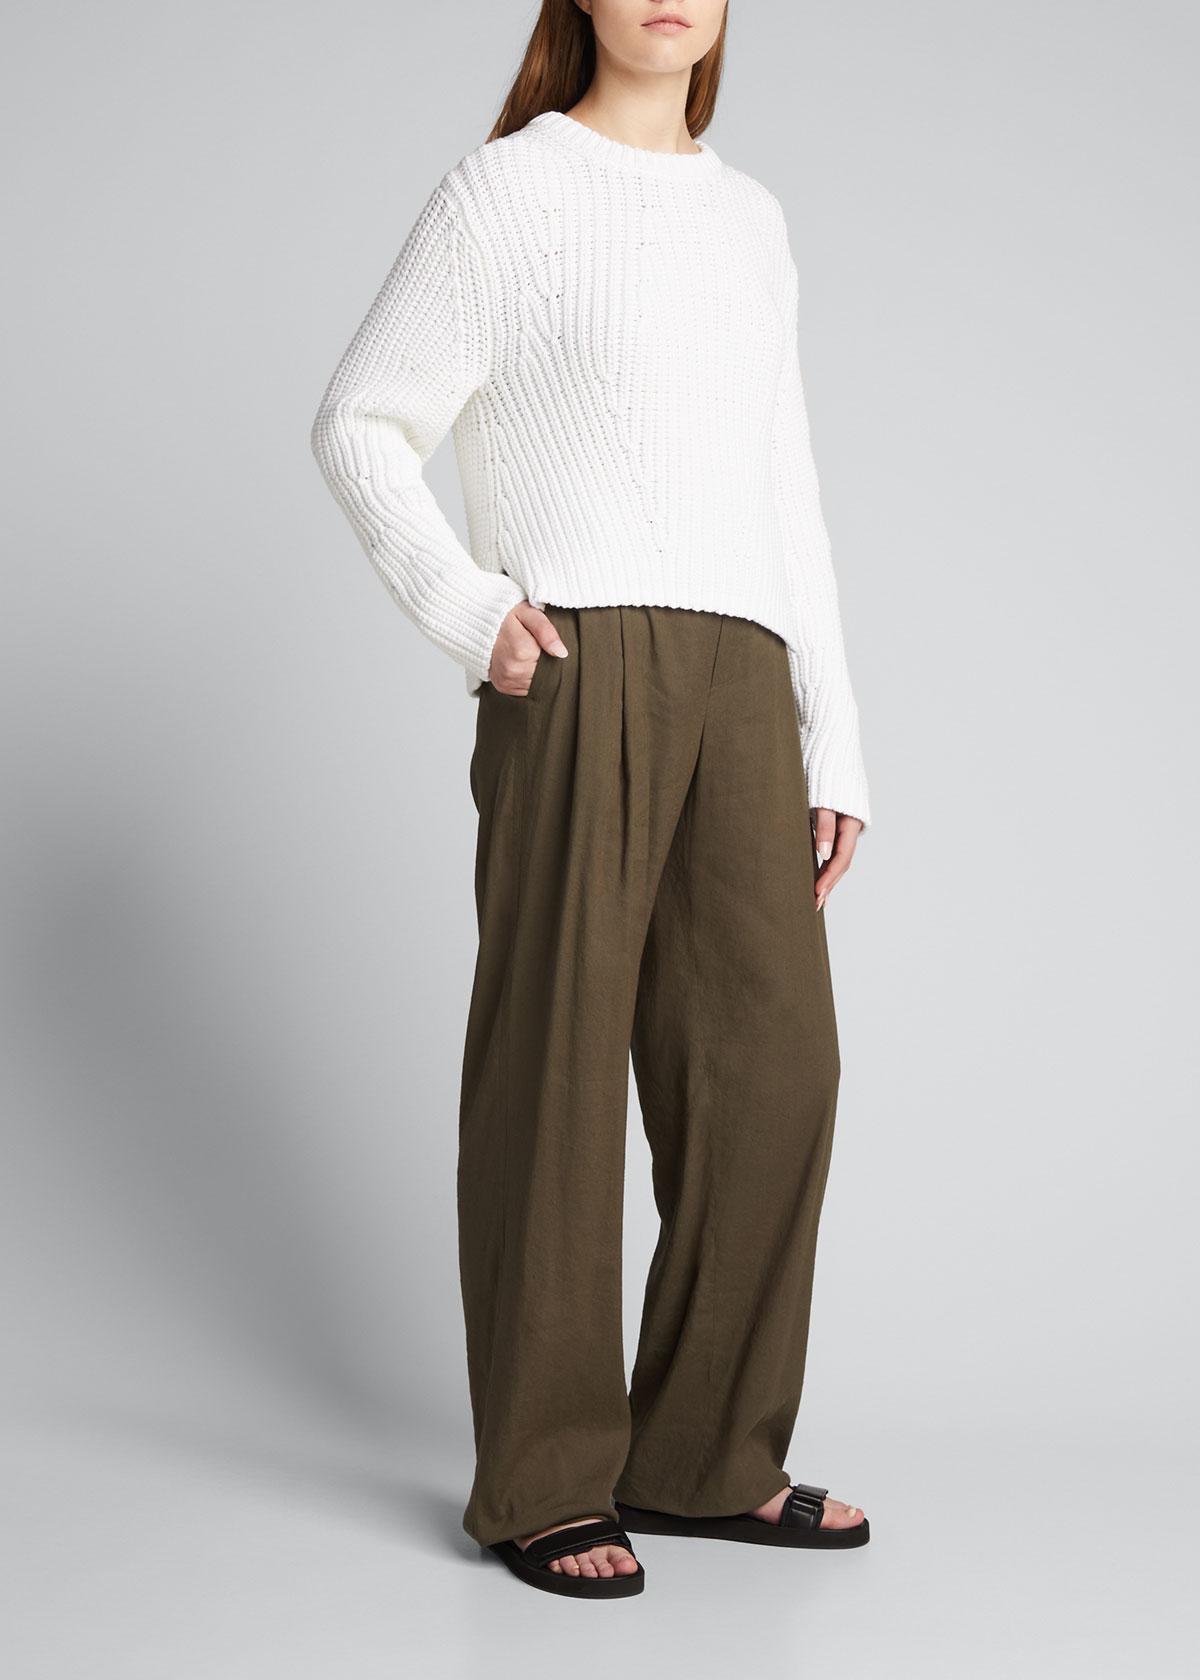 Vince Linens LINEN WIDE-LEG PULL-ON PANTS